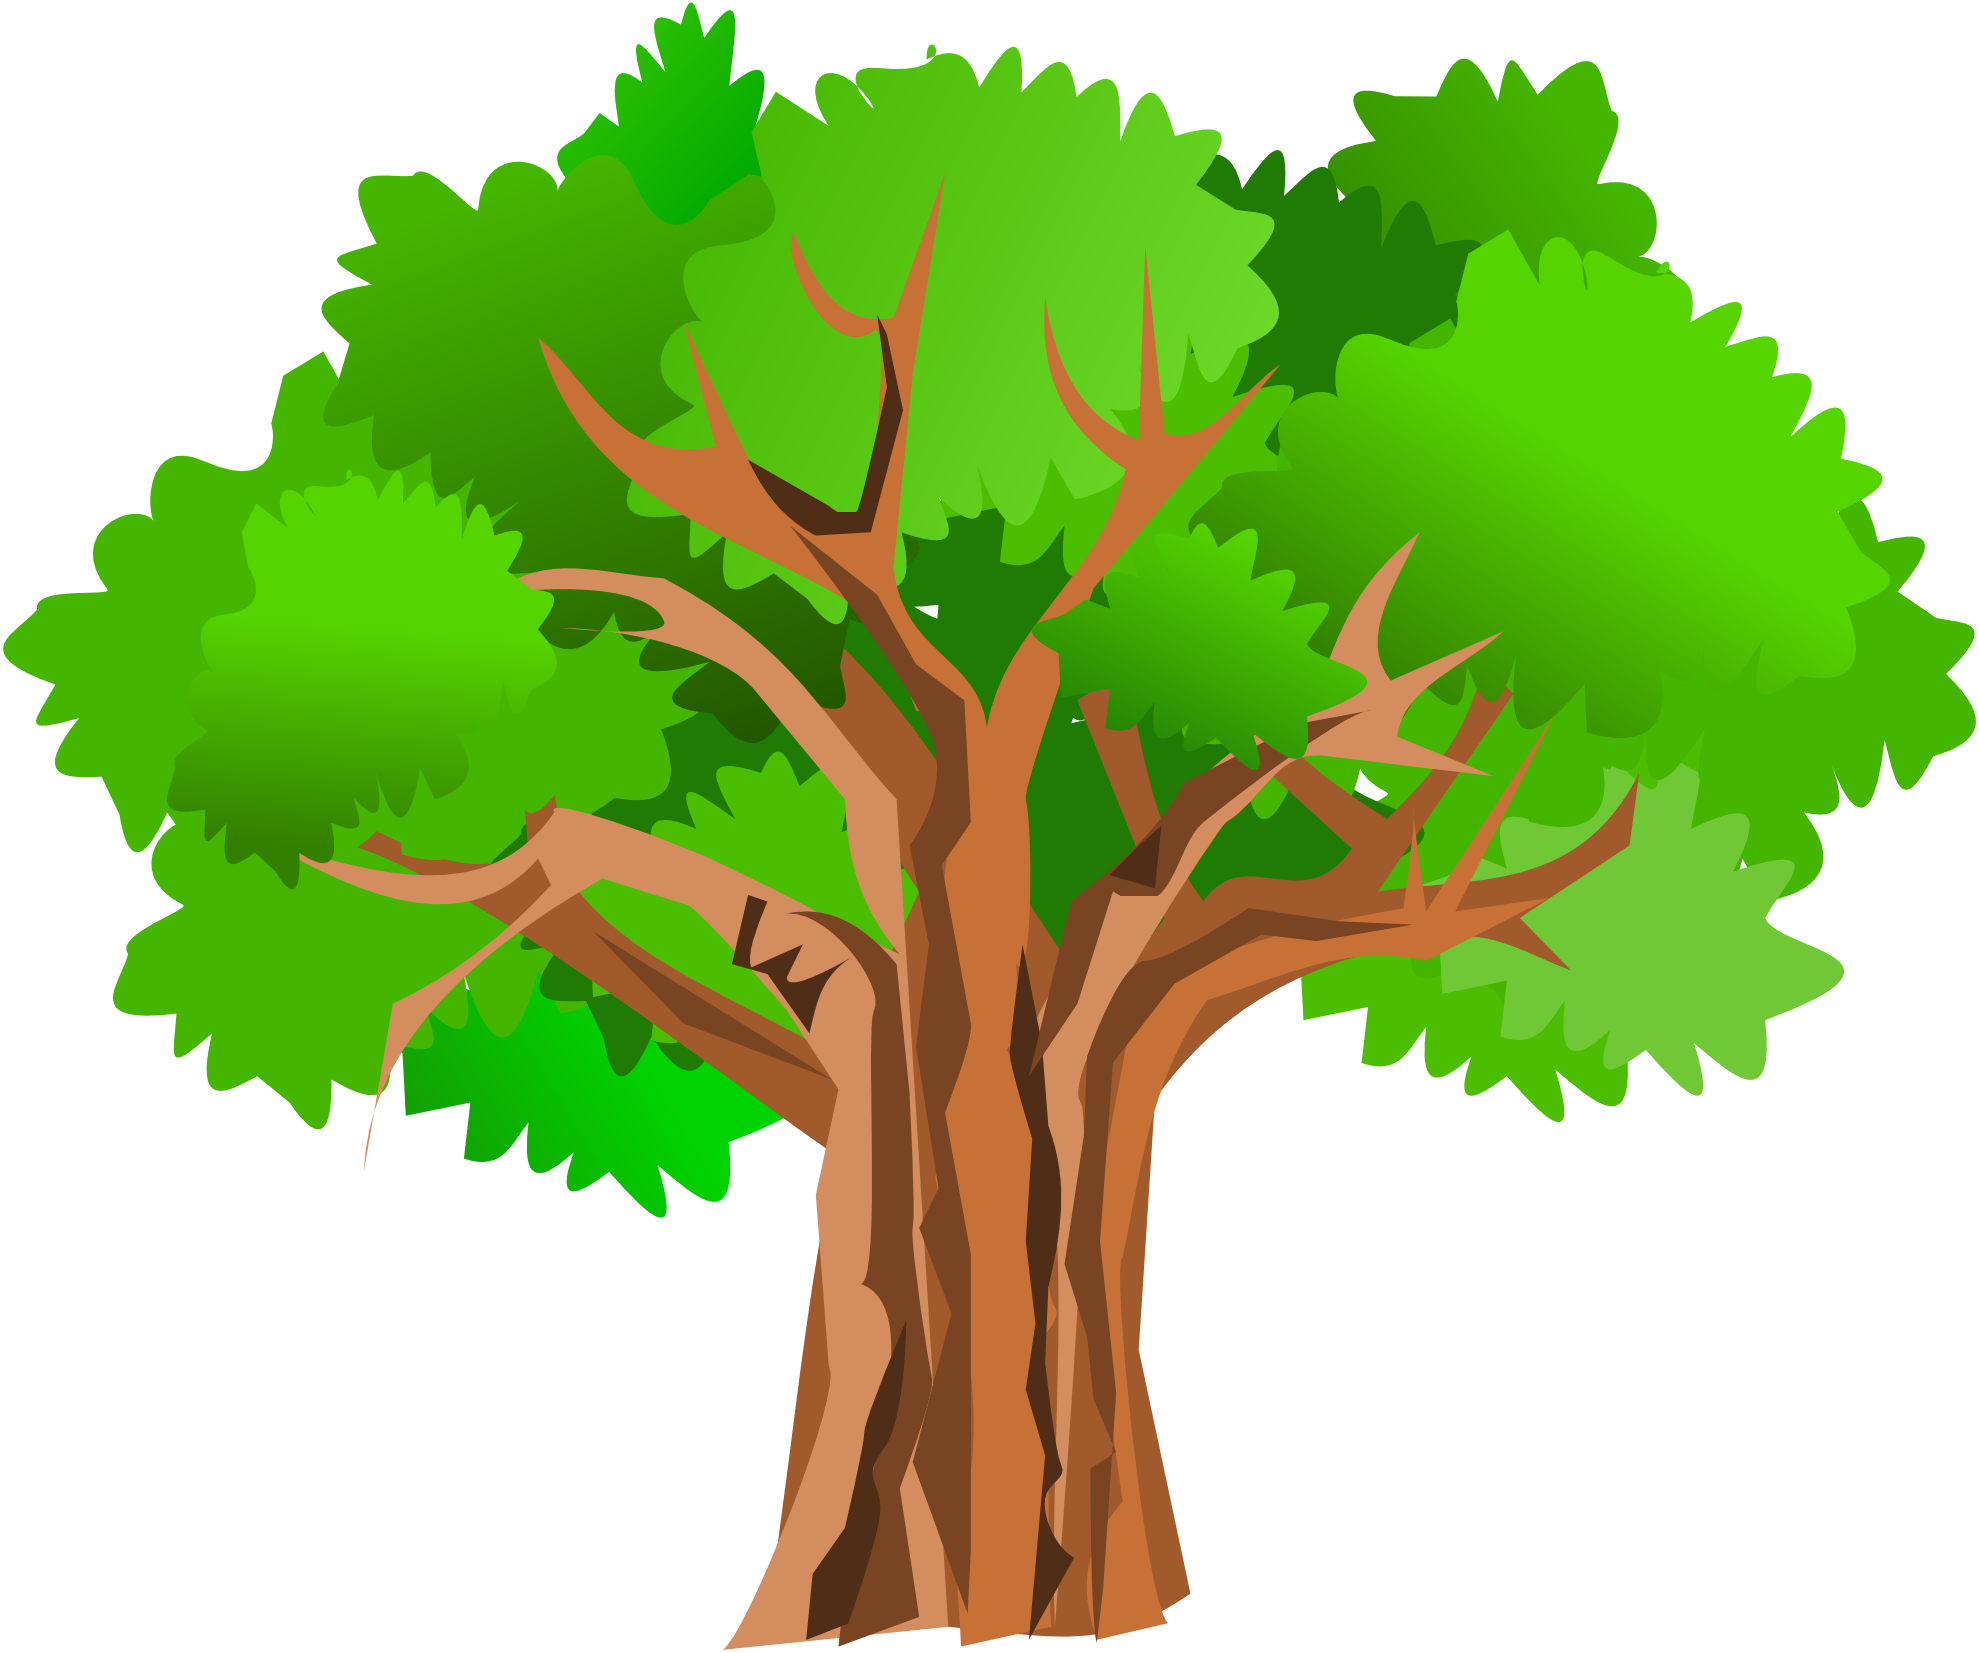 oak tree silhouette clip art free at getdrawings com free for rh getdrawings com oak tree clip art free oak tree clipart silhouette